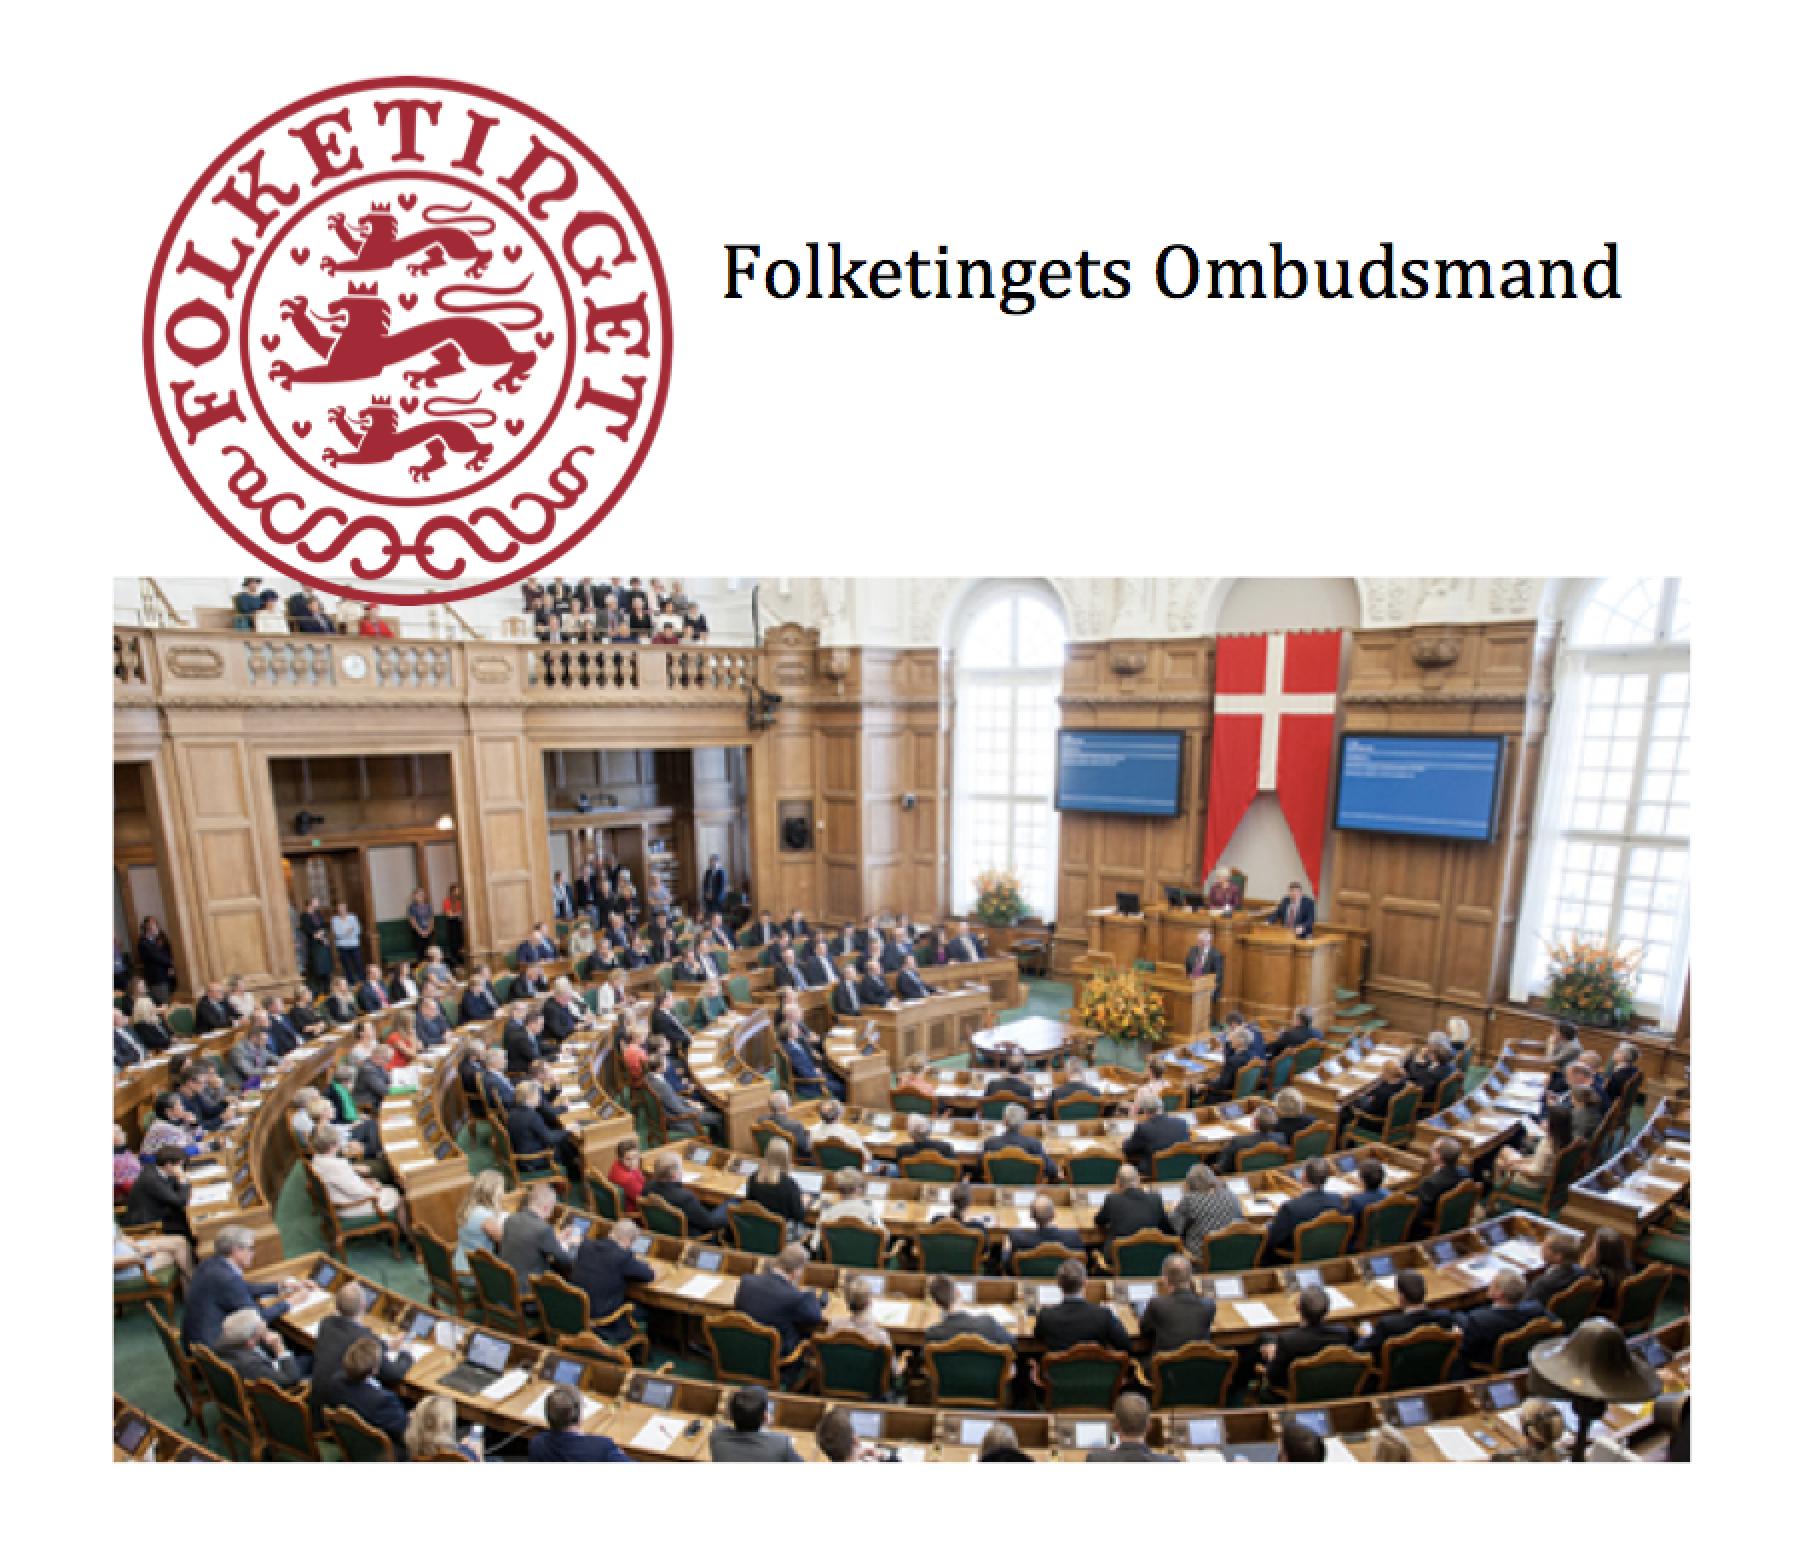 LÆRERKONFLIKT 2013 : DANMARKS LÆRERFORENING HAR KONTAKTET OMBUDSMANDEN